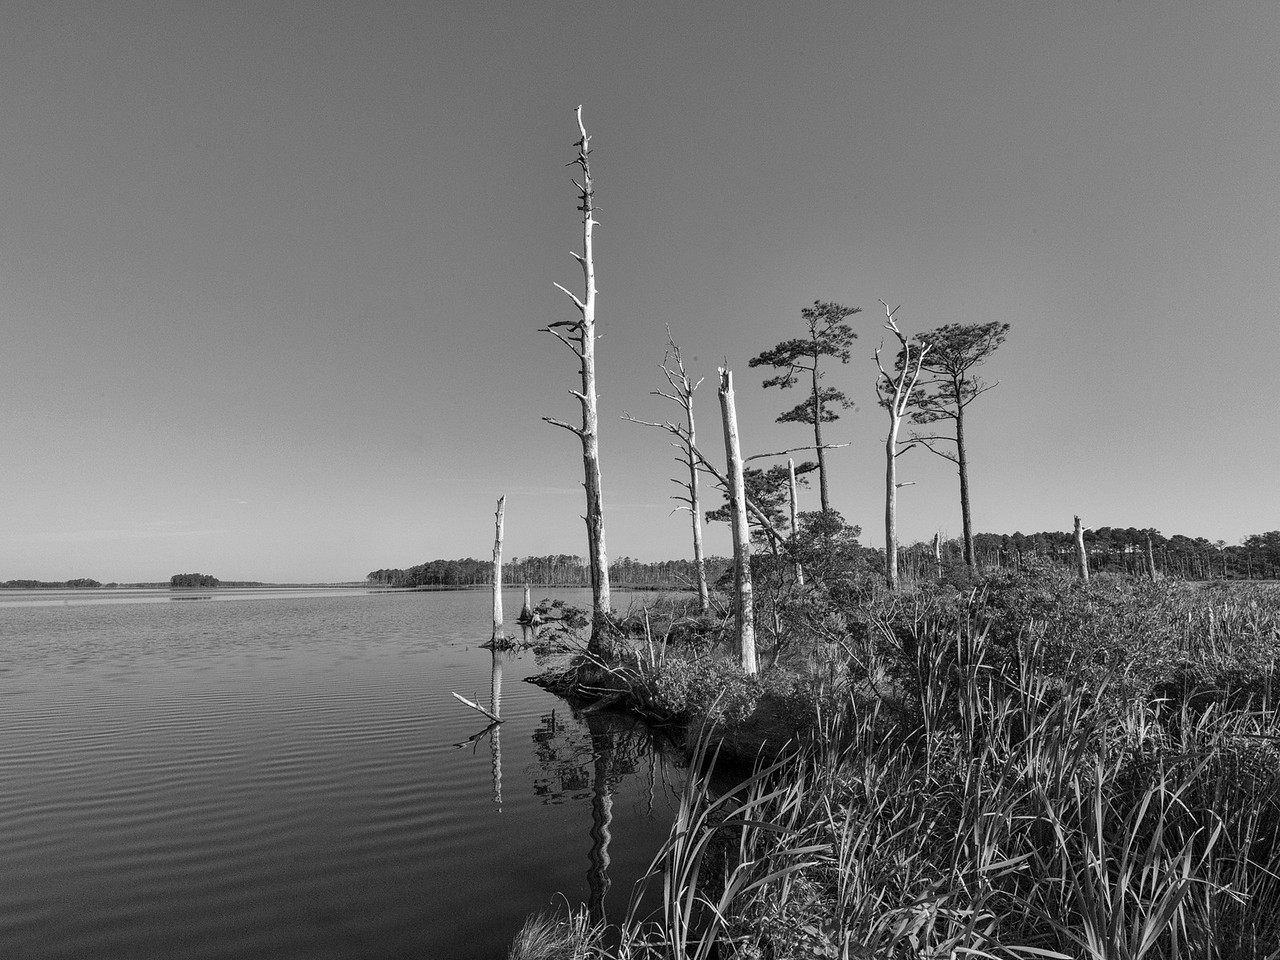 Blackwater River Landscape - Monochrome